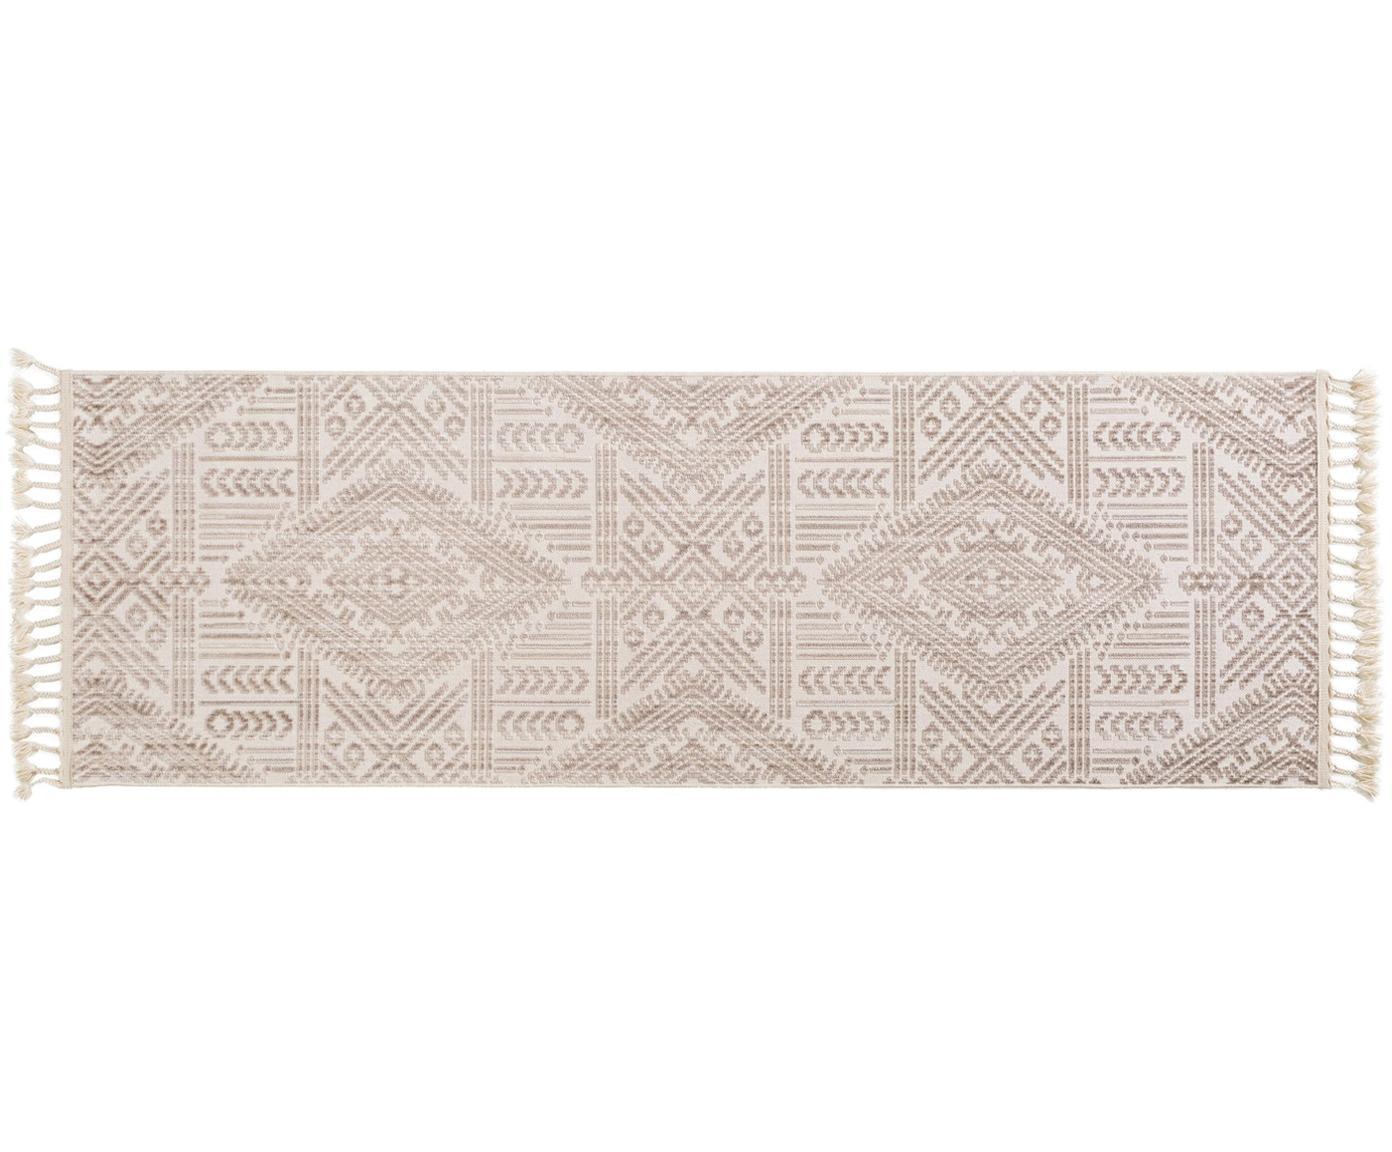 Chodnik Laila Tang, Odcienie kremowego, S 80 x D 240 cm